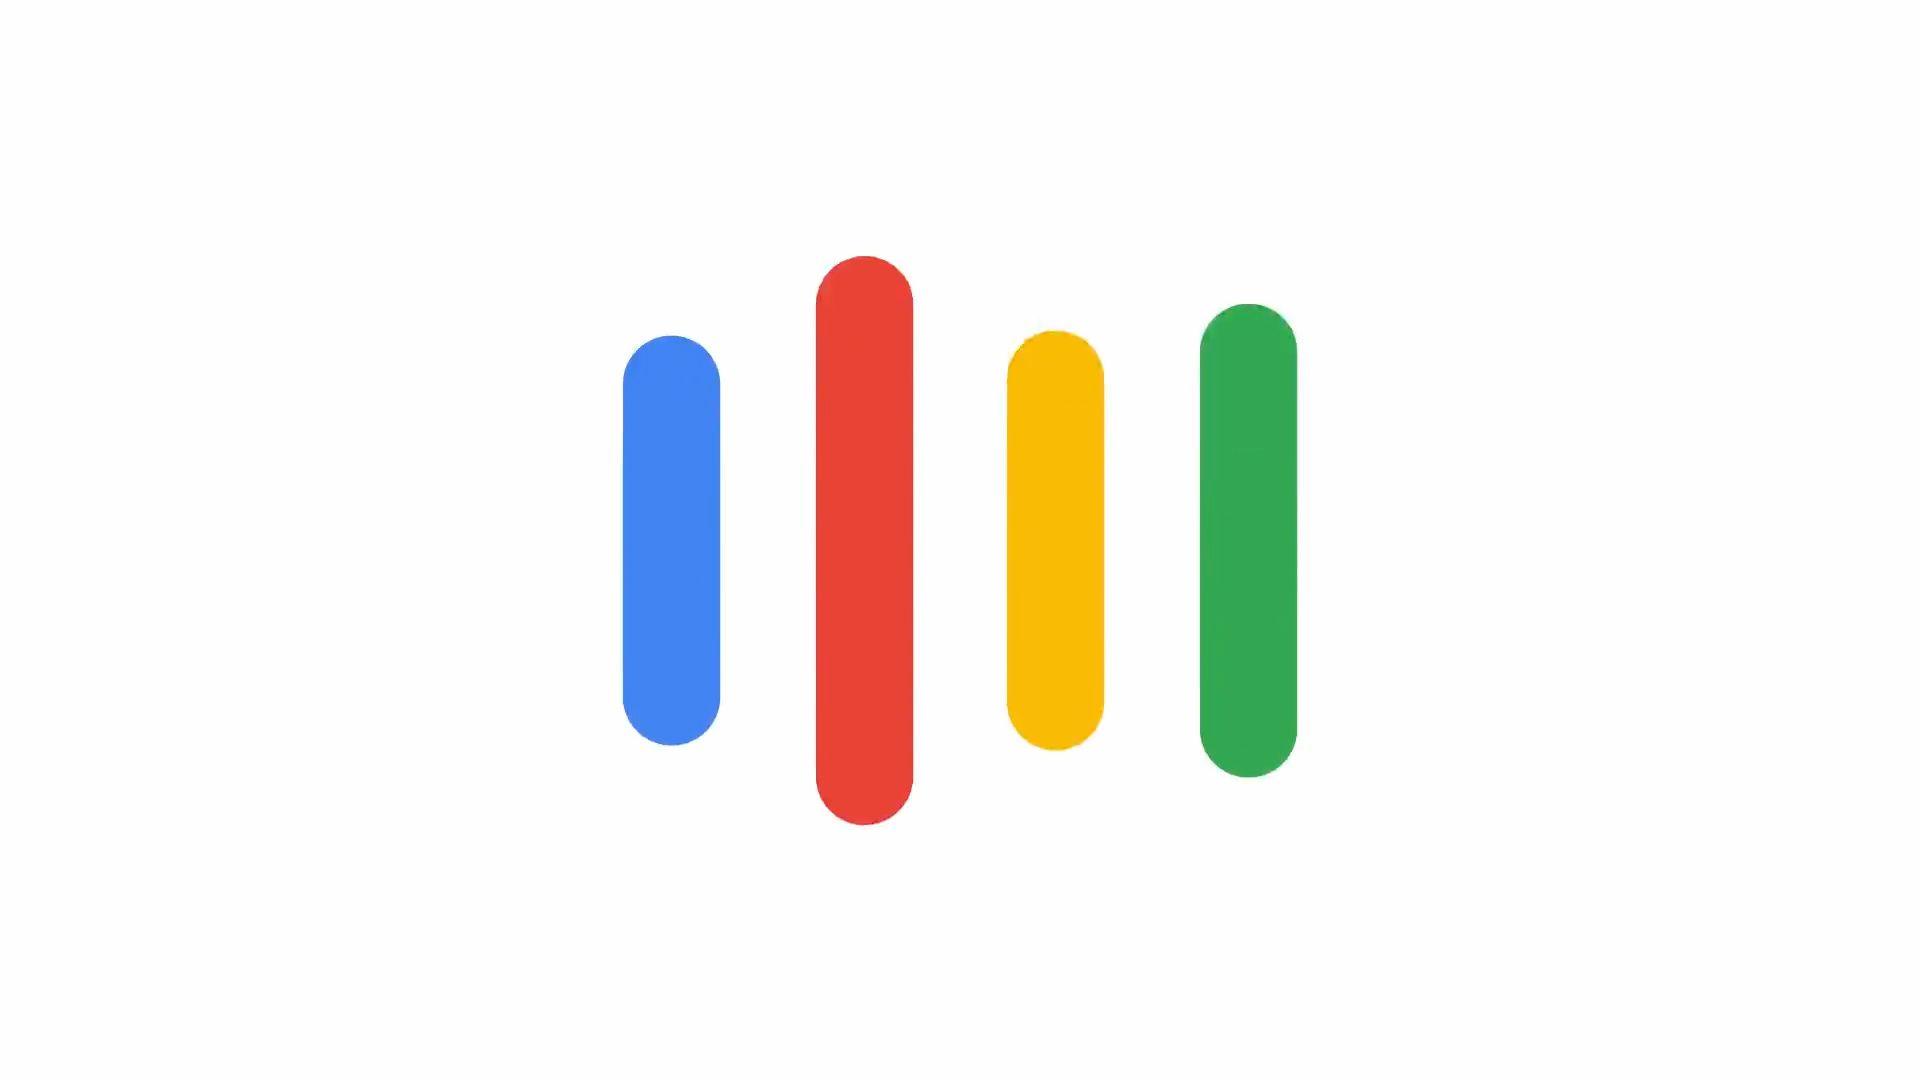 Google Assistant supporterà presto più di 30 lingue thumbnail